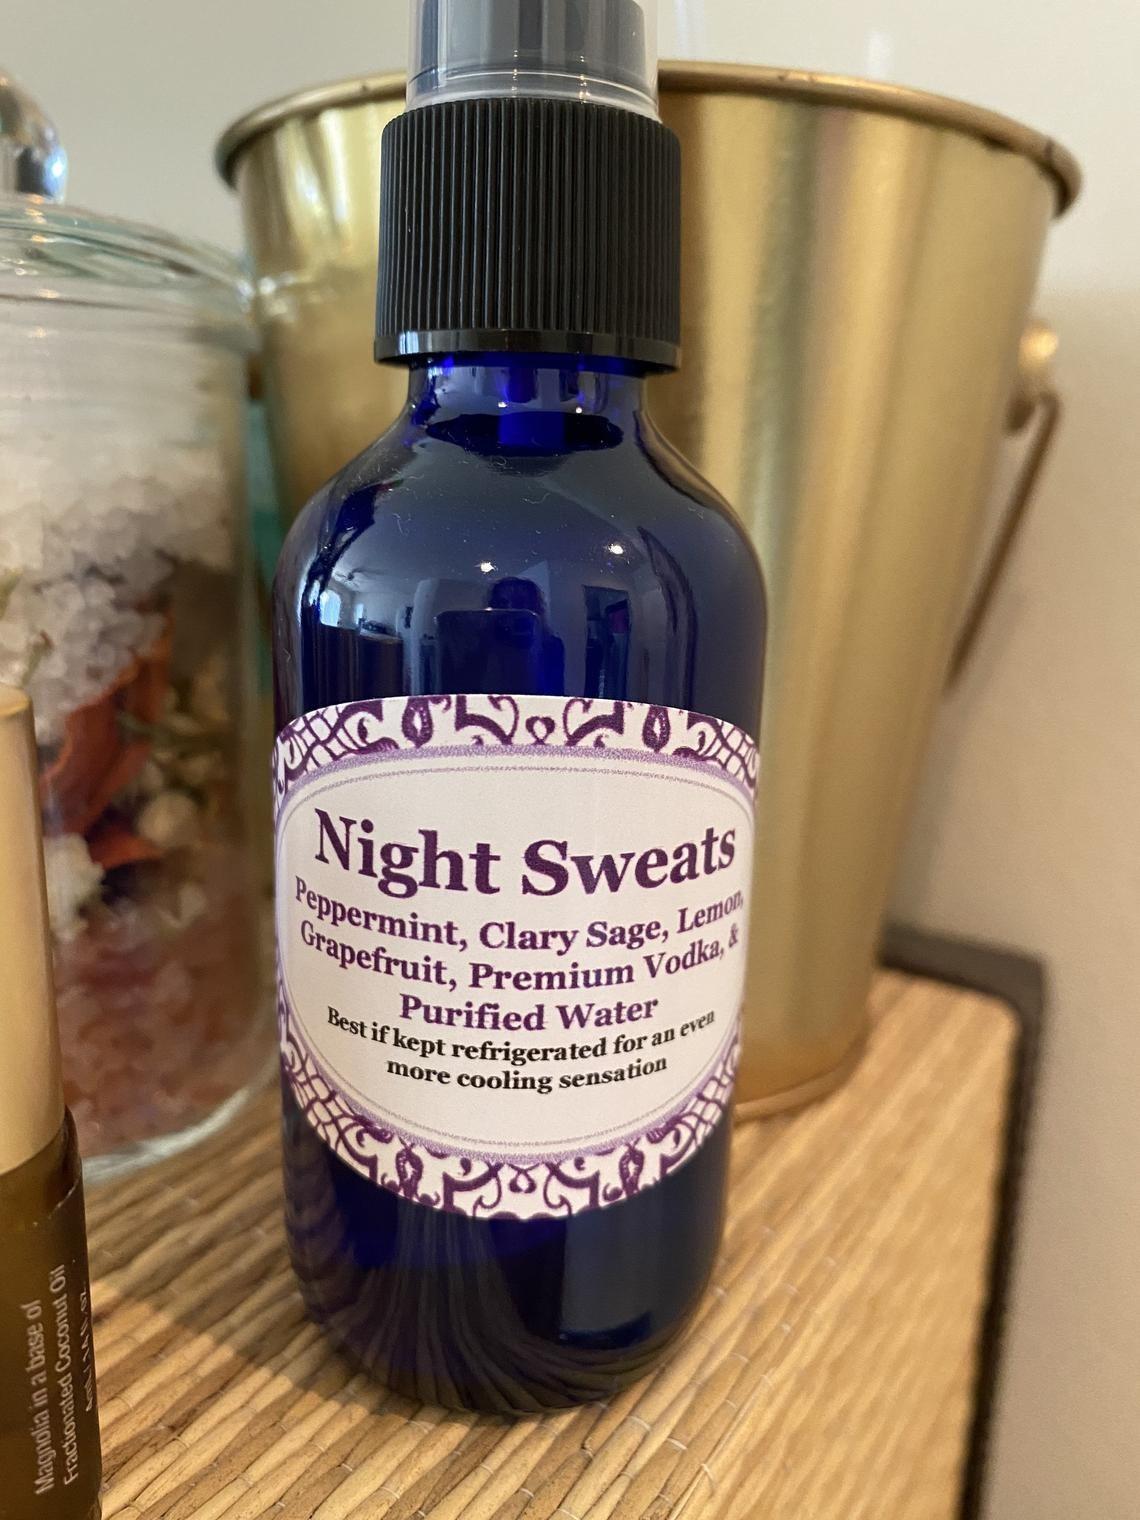 The bottle of Night Sweats